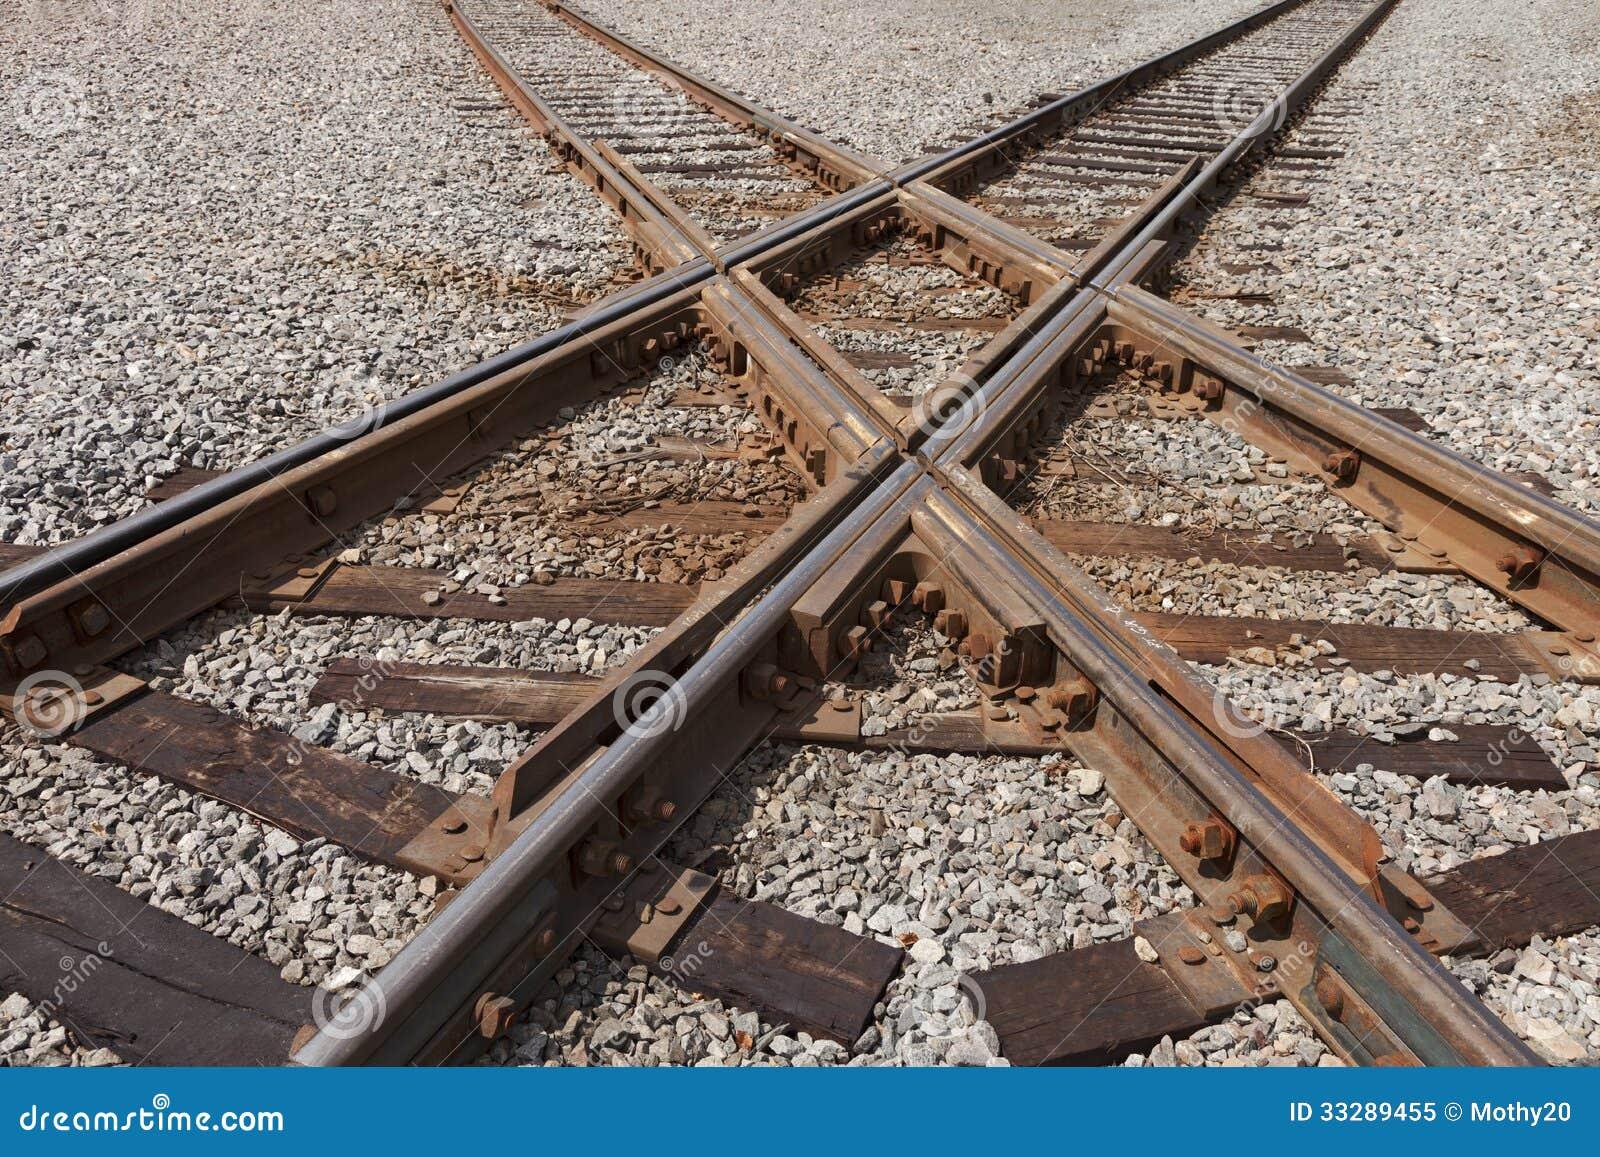 Railroad Crossing Tracks